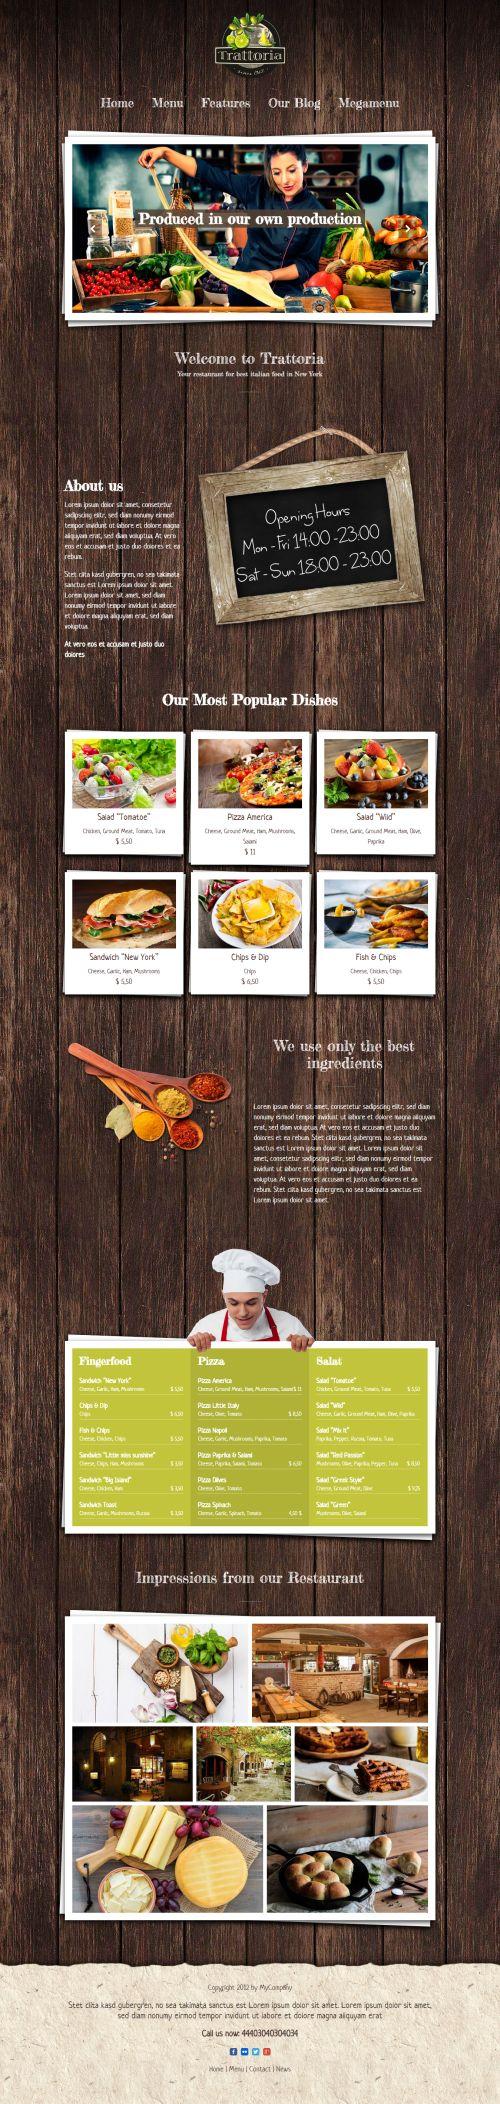 Trattoria - rustic WordPress Restaurant Theme. Trattoria is a very unique and beatiful designed WordPress Restaurant theme.   http://7theme.net/downloads/trattoria-wordpress-restaurant-theme/  #WP #WordPress #Theme #Webdesign #Restaurant #unique #rustic